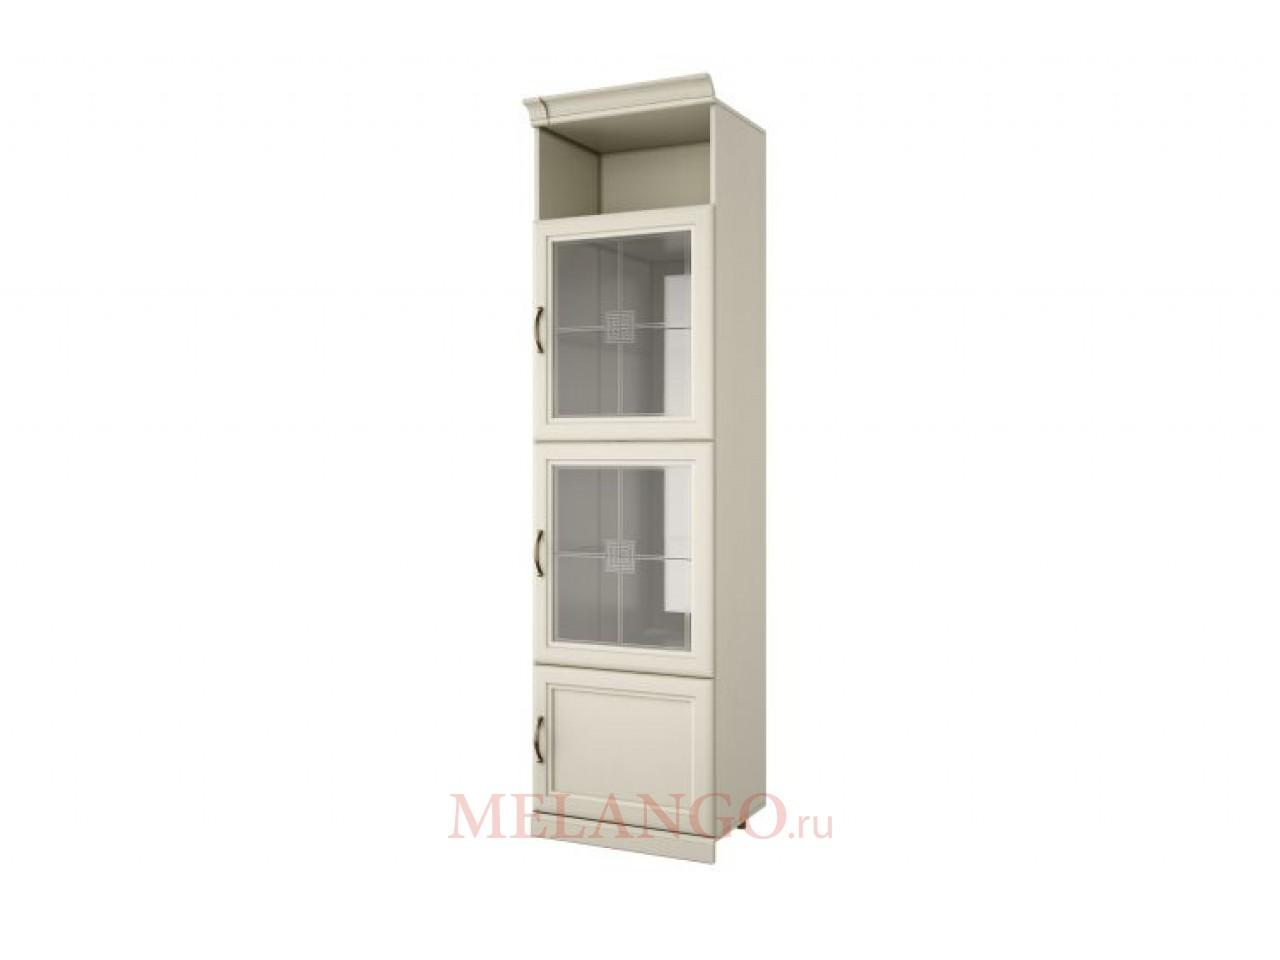 Шкаф-витрина Луара ЛУ-224.26в